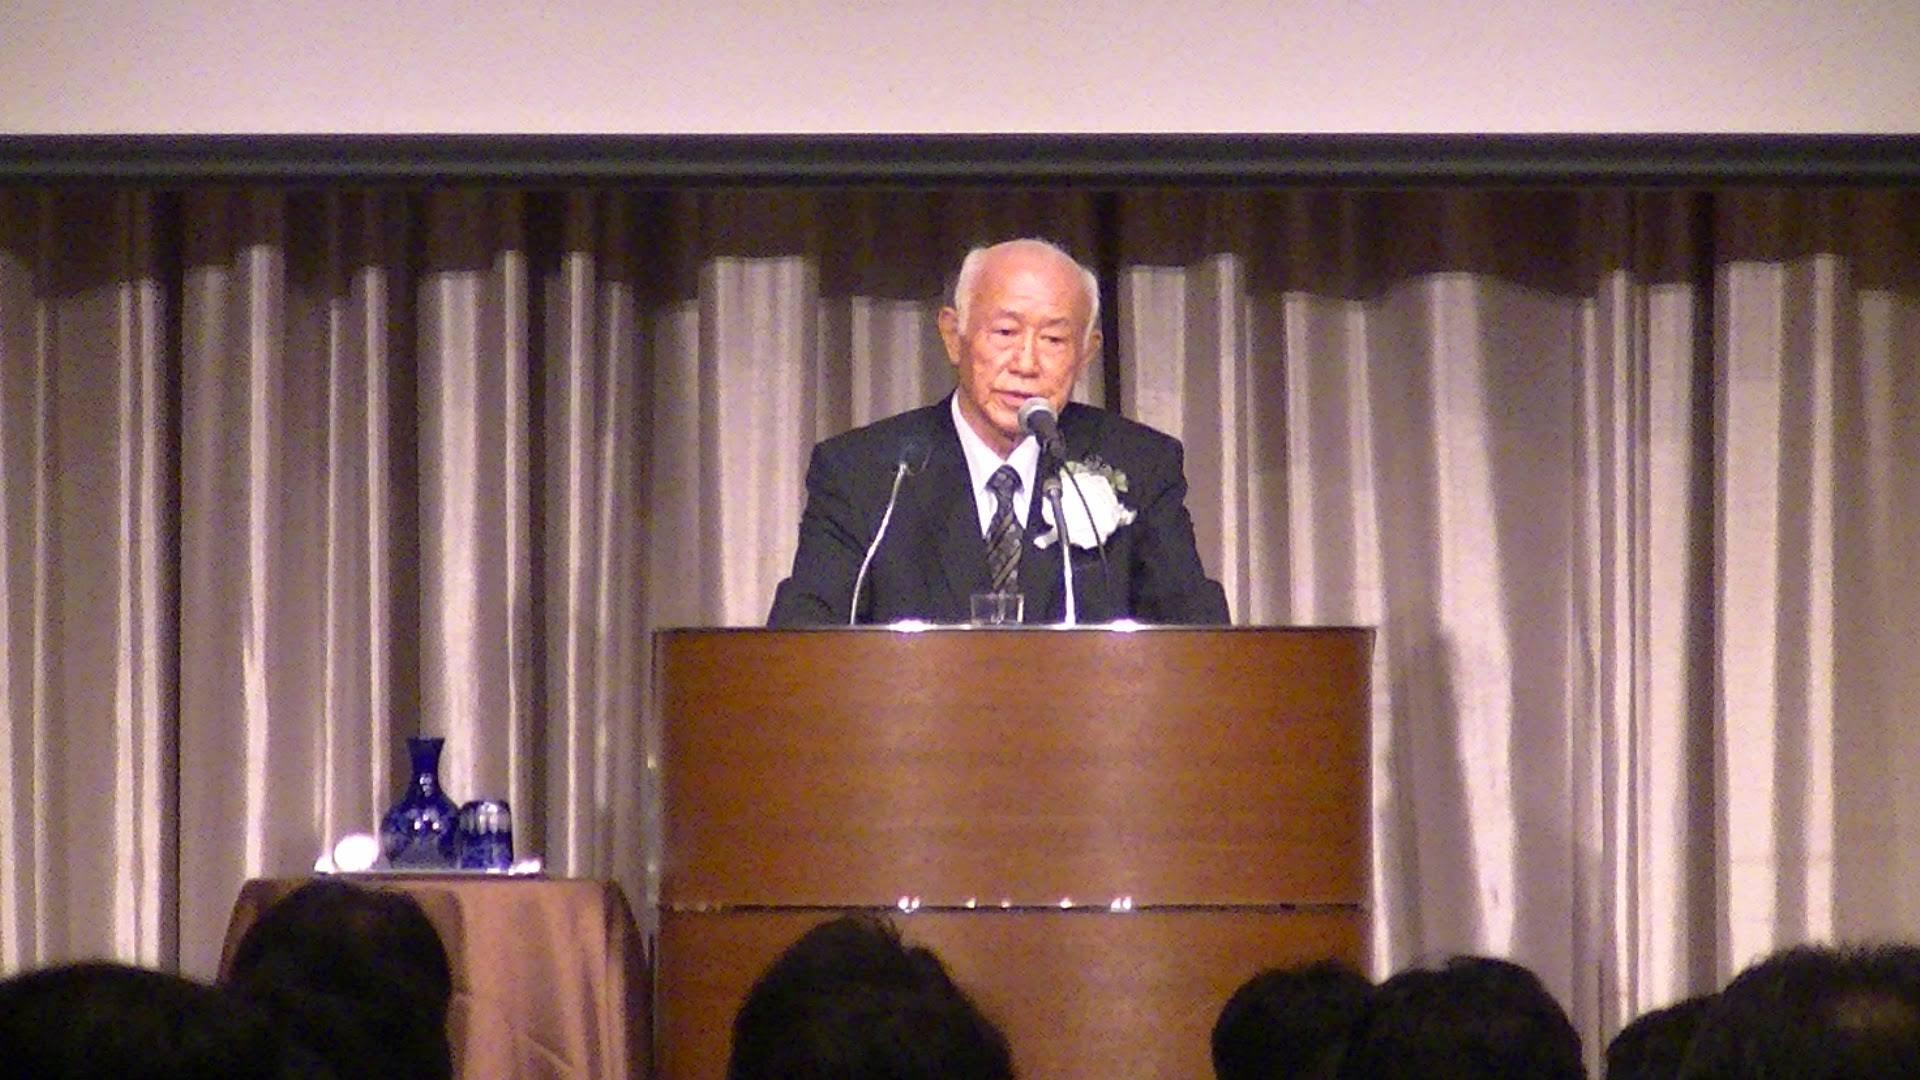 PIC 1668 1 - 思風会全国大会in広島